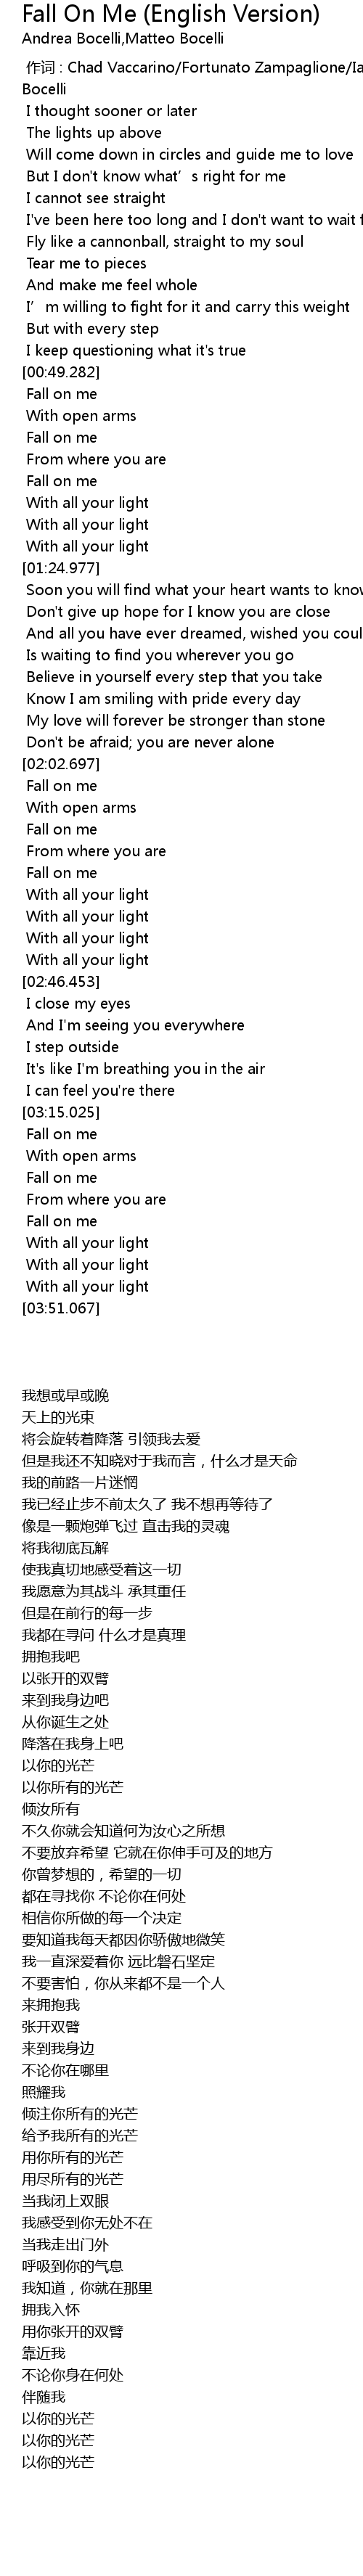 Fall On Me English Version Lyrics   Follow Lyrics